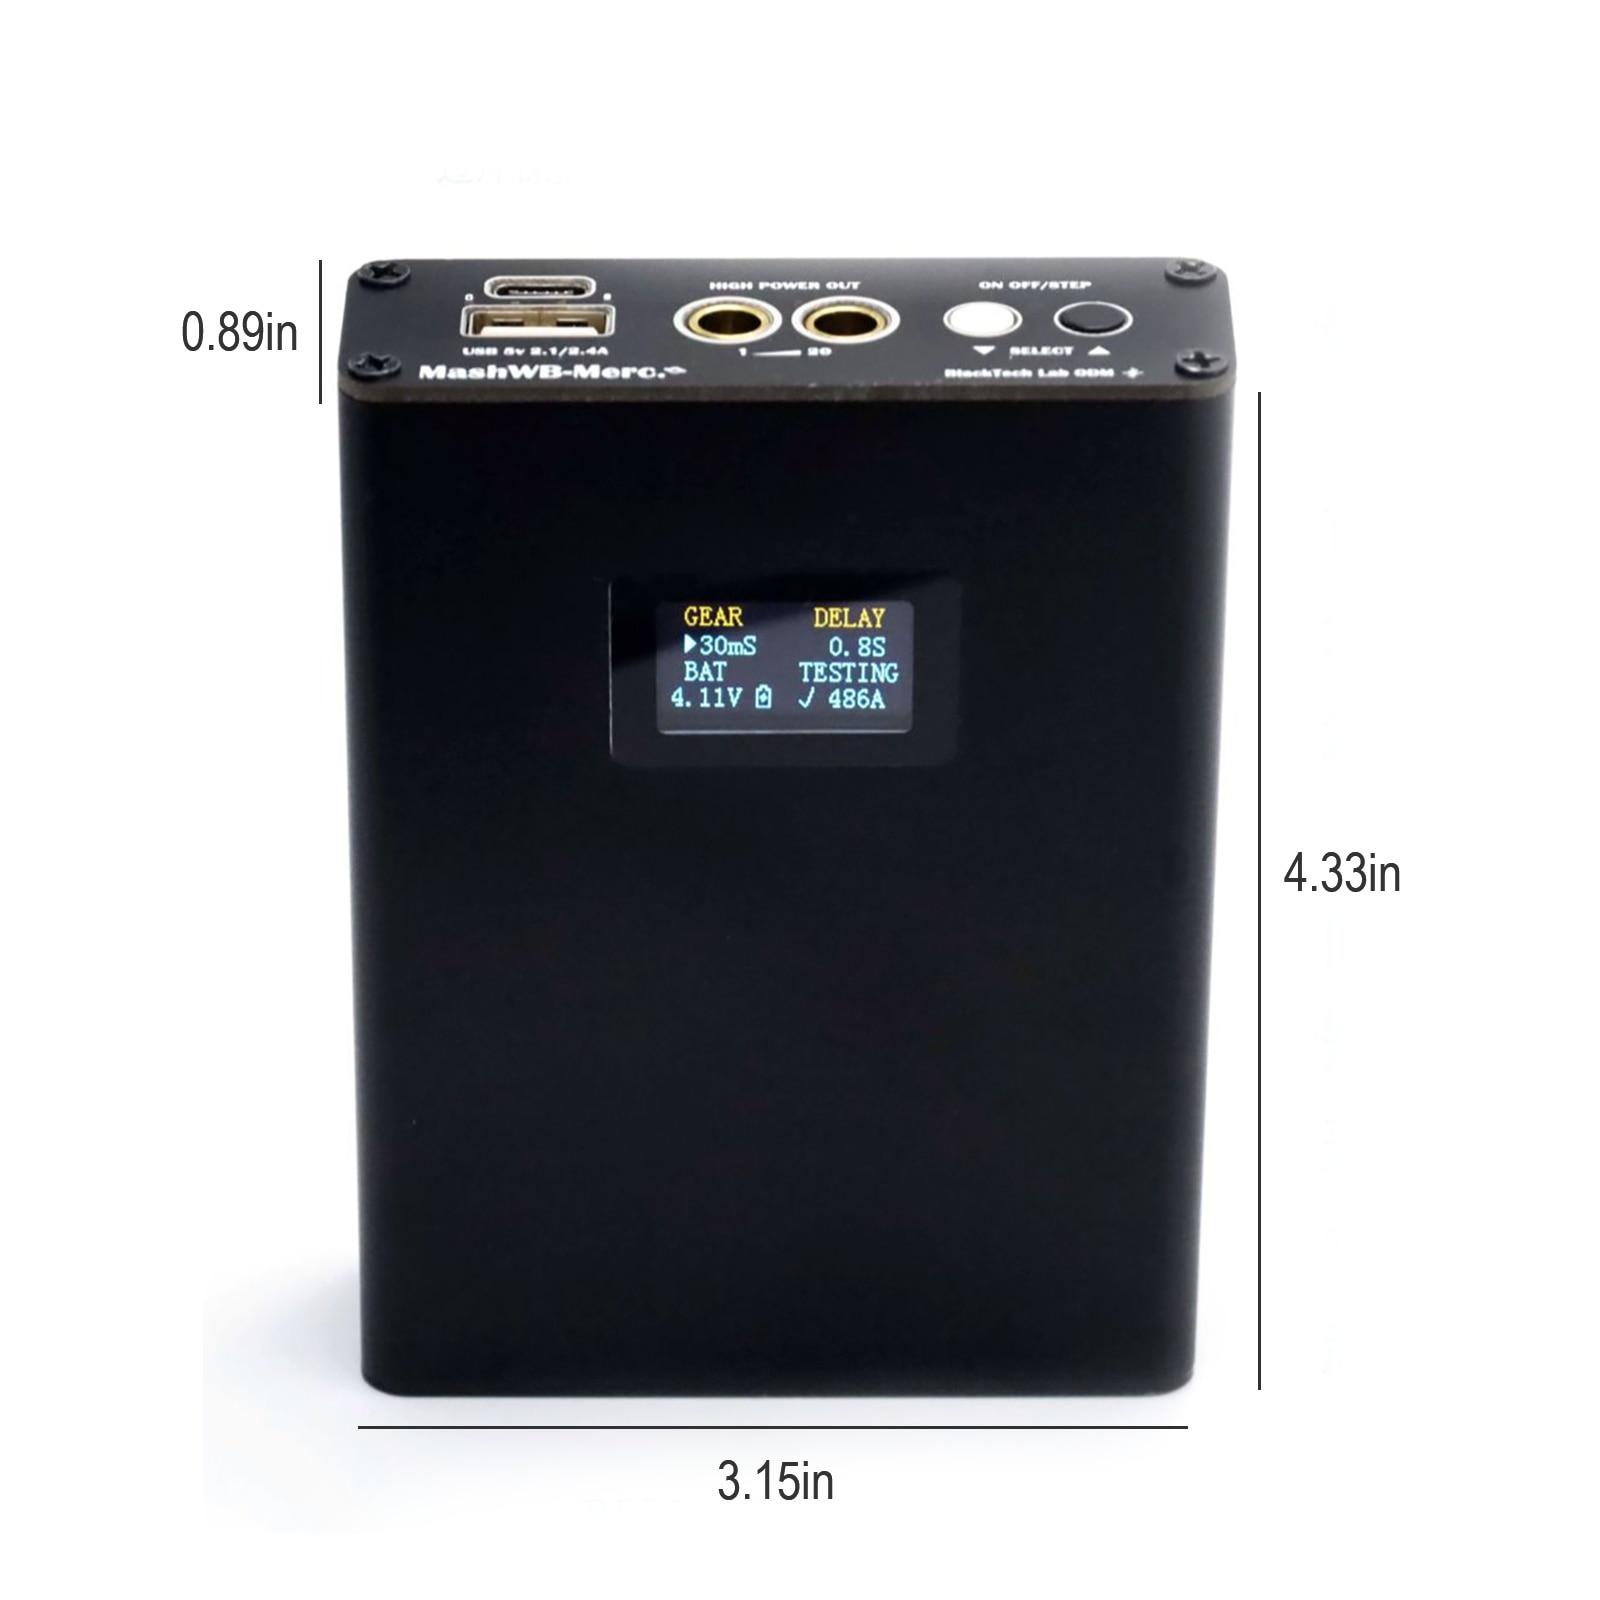 BTL-02 Mini Spot Welding Machine Digital Display Portable Spot Welding Machine Handheld 18650 Lithium Battery Power DIY Kit enlarge